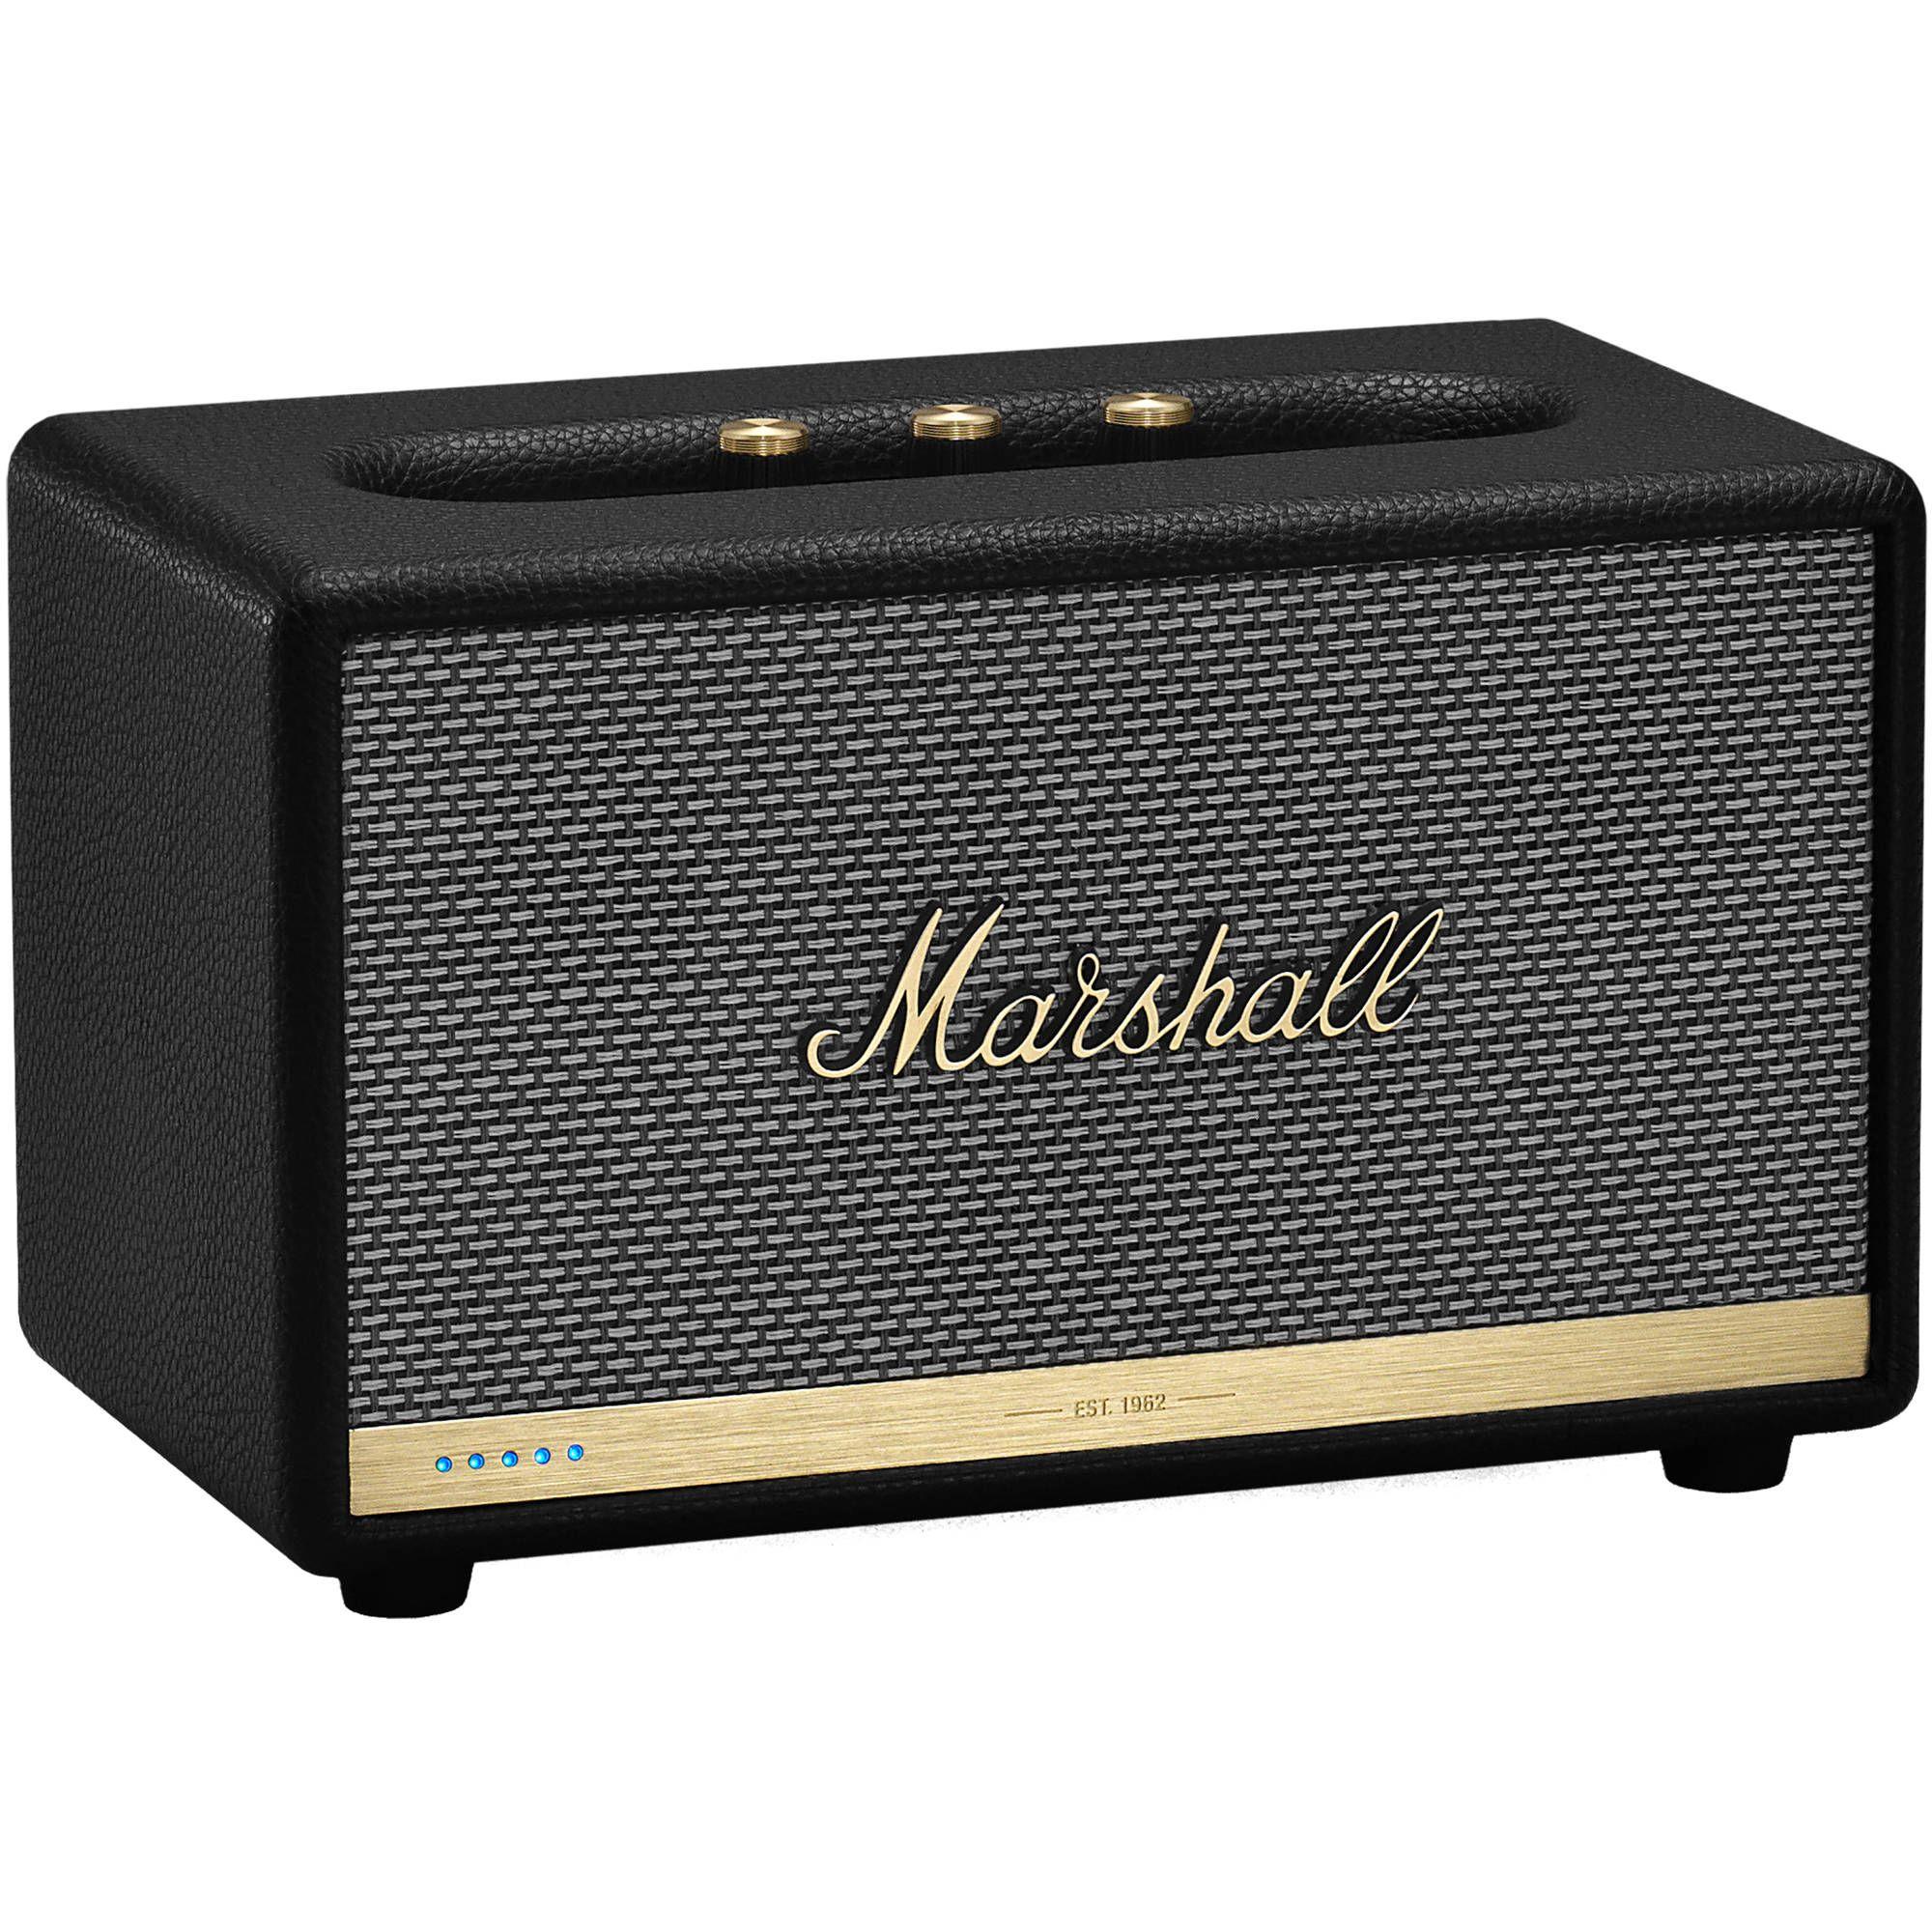 Marshall Acton II Voice: Lautsprecher mit Sprachassistent (Google Assistant, Multiroom, Chromecast)